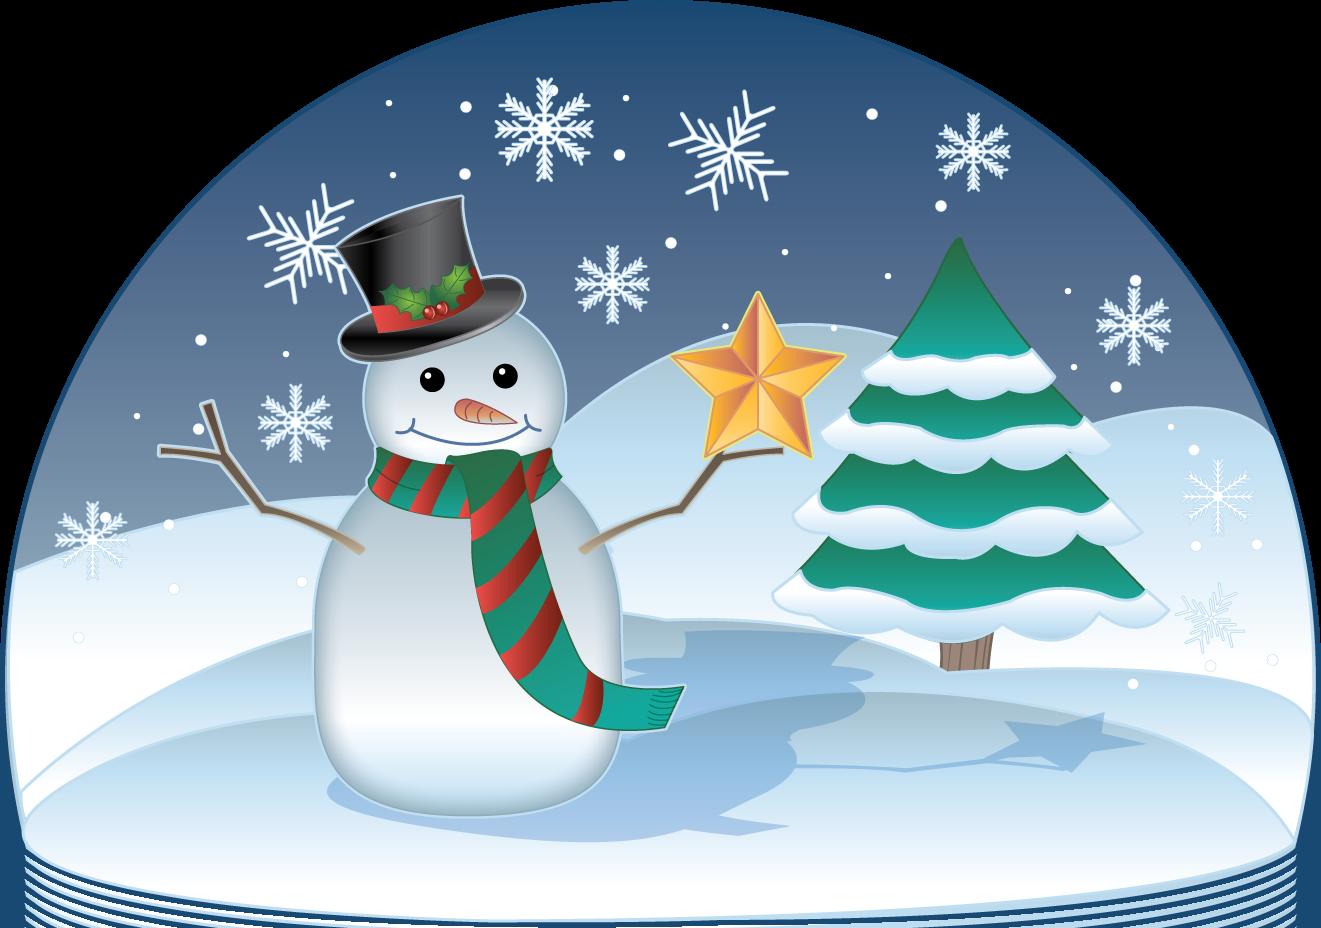 Free Clip Art Holiday Clip Art Christmas-Free Clip Art Holiday Clip Art Christmas Snowman In Winter-4